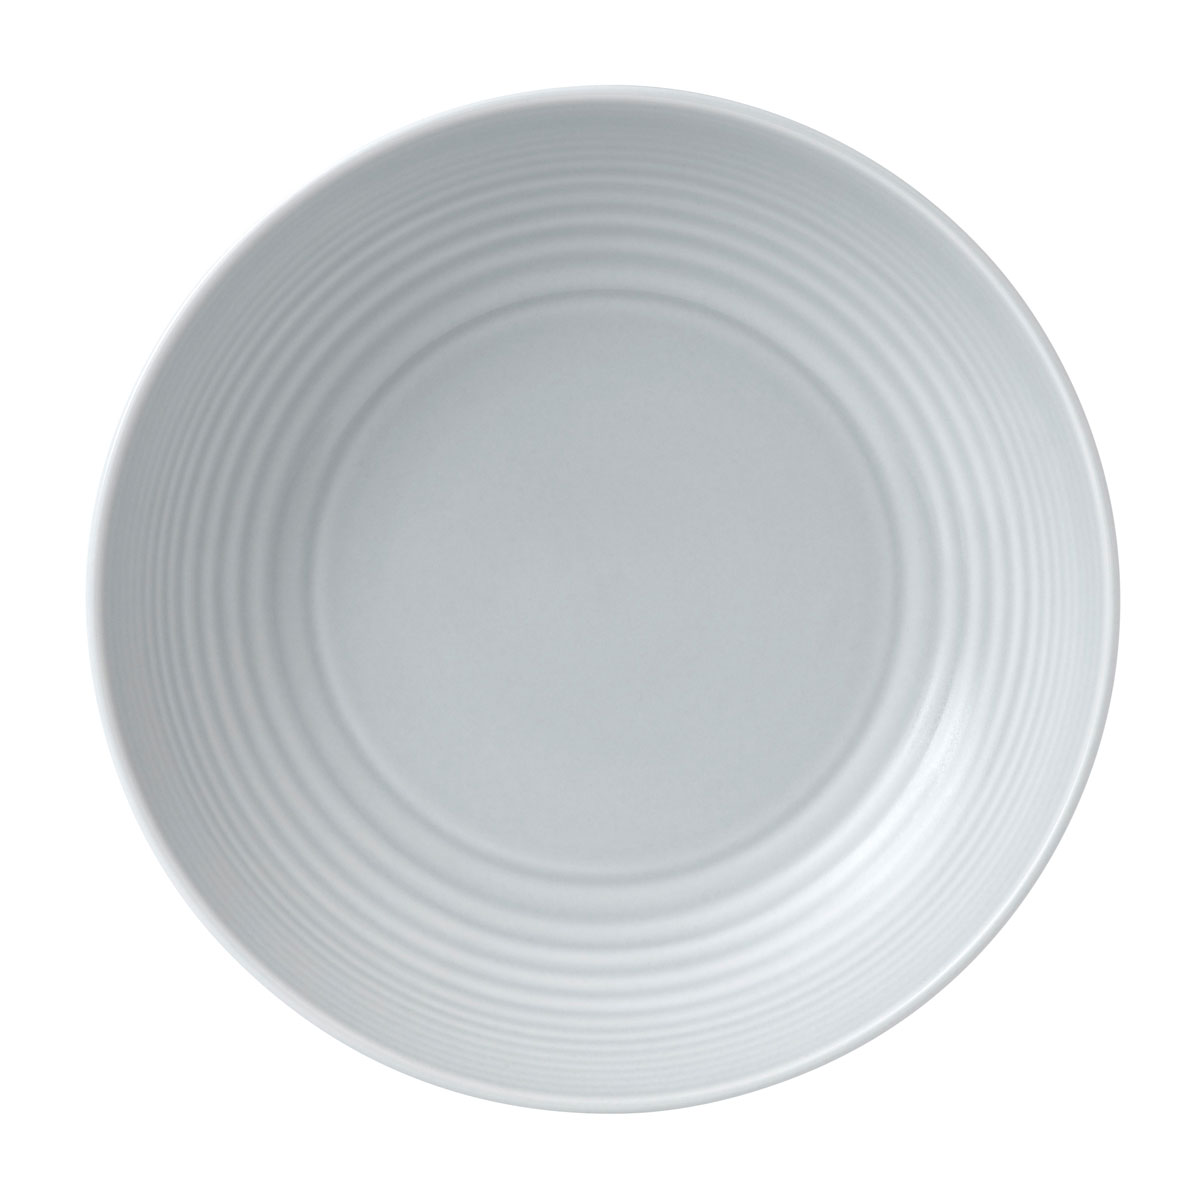 Royal Doulton Gordon Ramsay Maze Light Grey Pasta Bowl